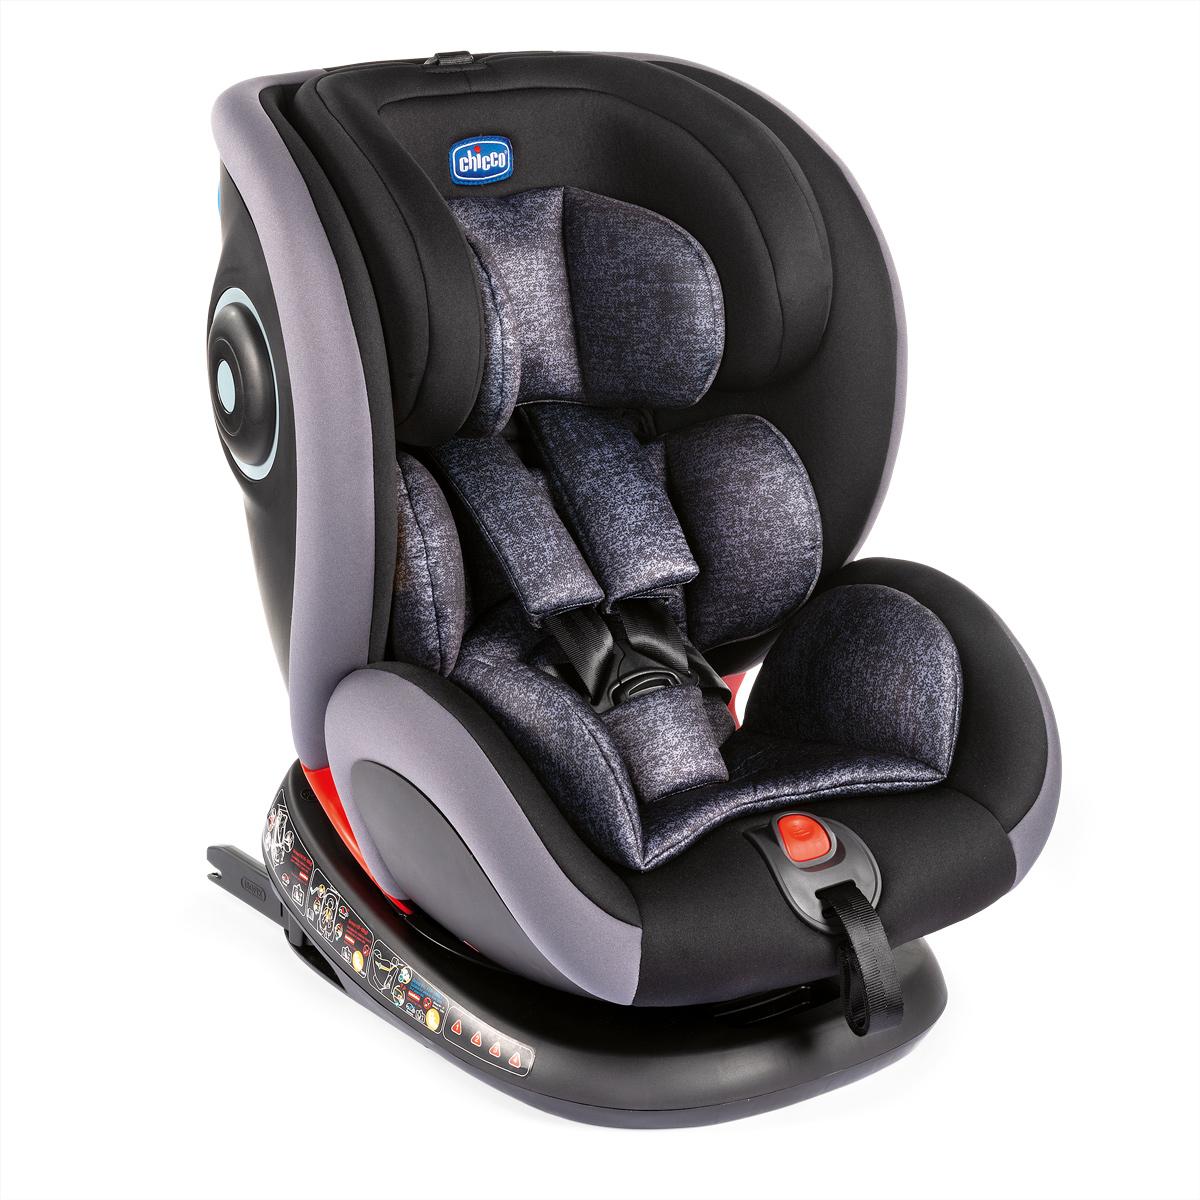 Scaun auto isofix rotativ Chicco Seat4Fix, Graphite, grupa 0+/1/2/3, 0-36Kg